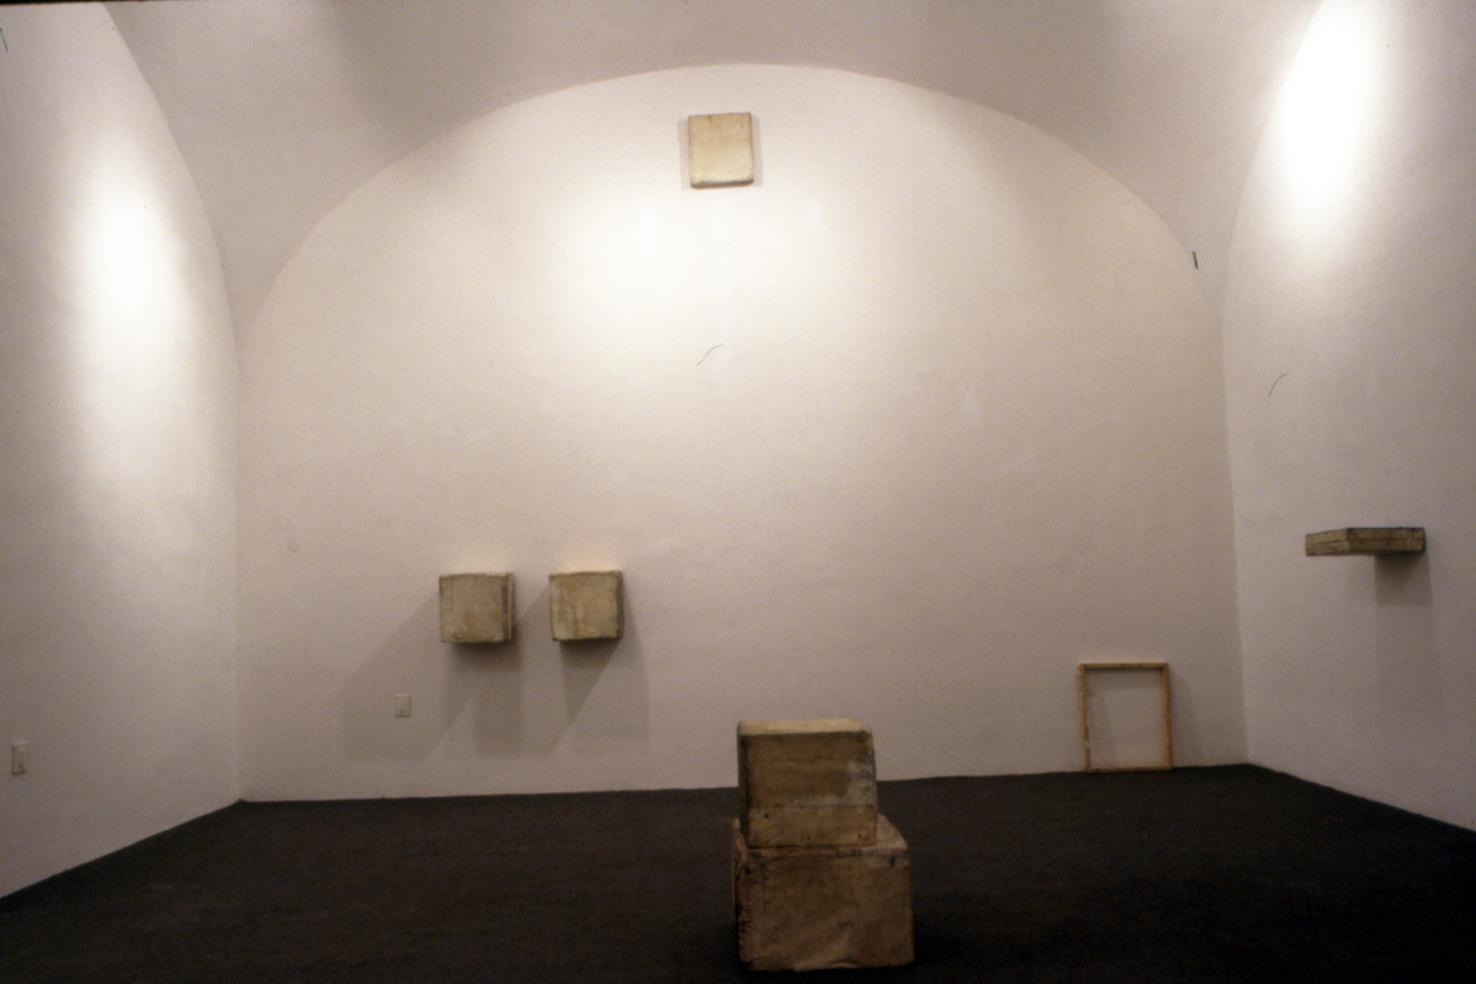 Lawrence Carroll - John Millei,  Paintings , 11 maggio 1995, Napoli